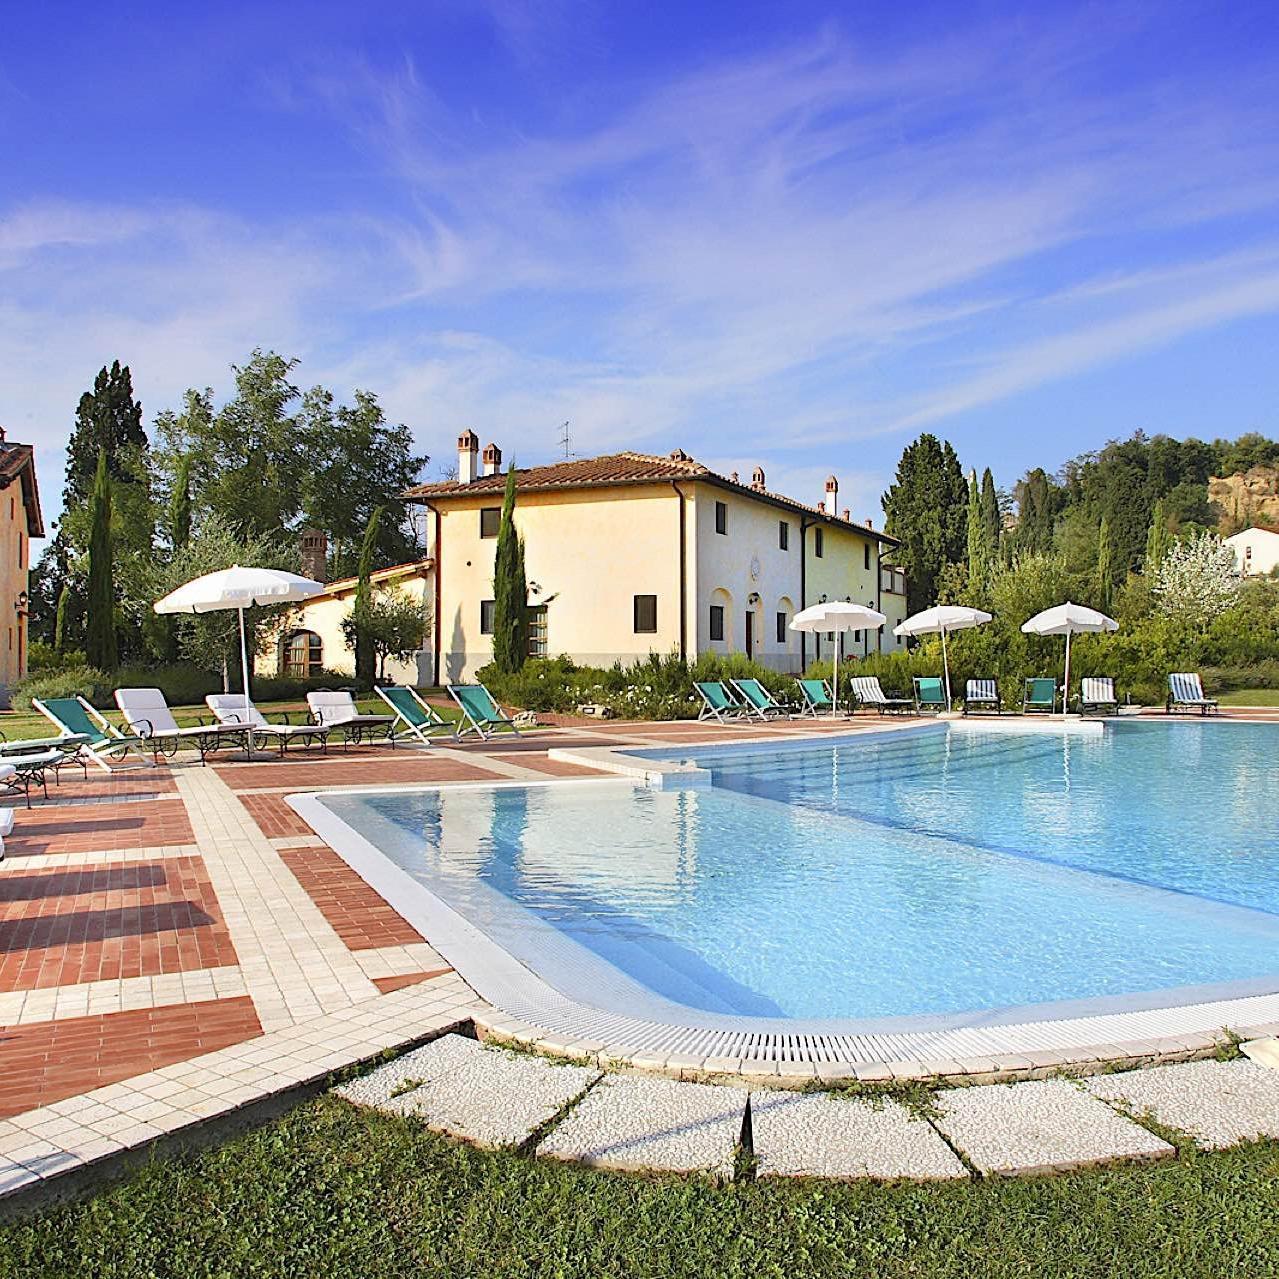 Villa-Vignola Pool   Fattoria Santo Stefano